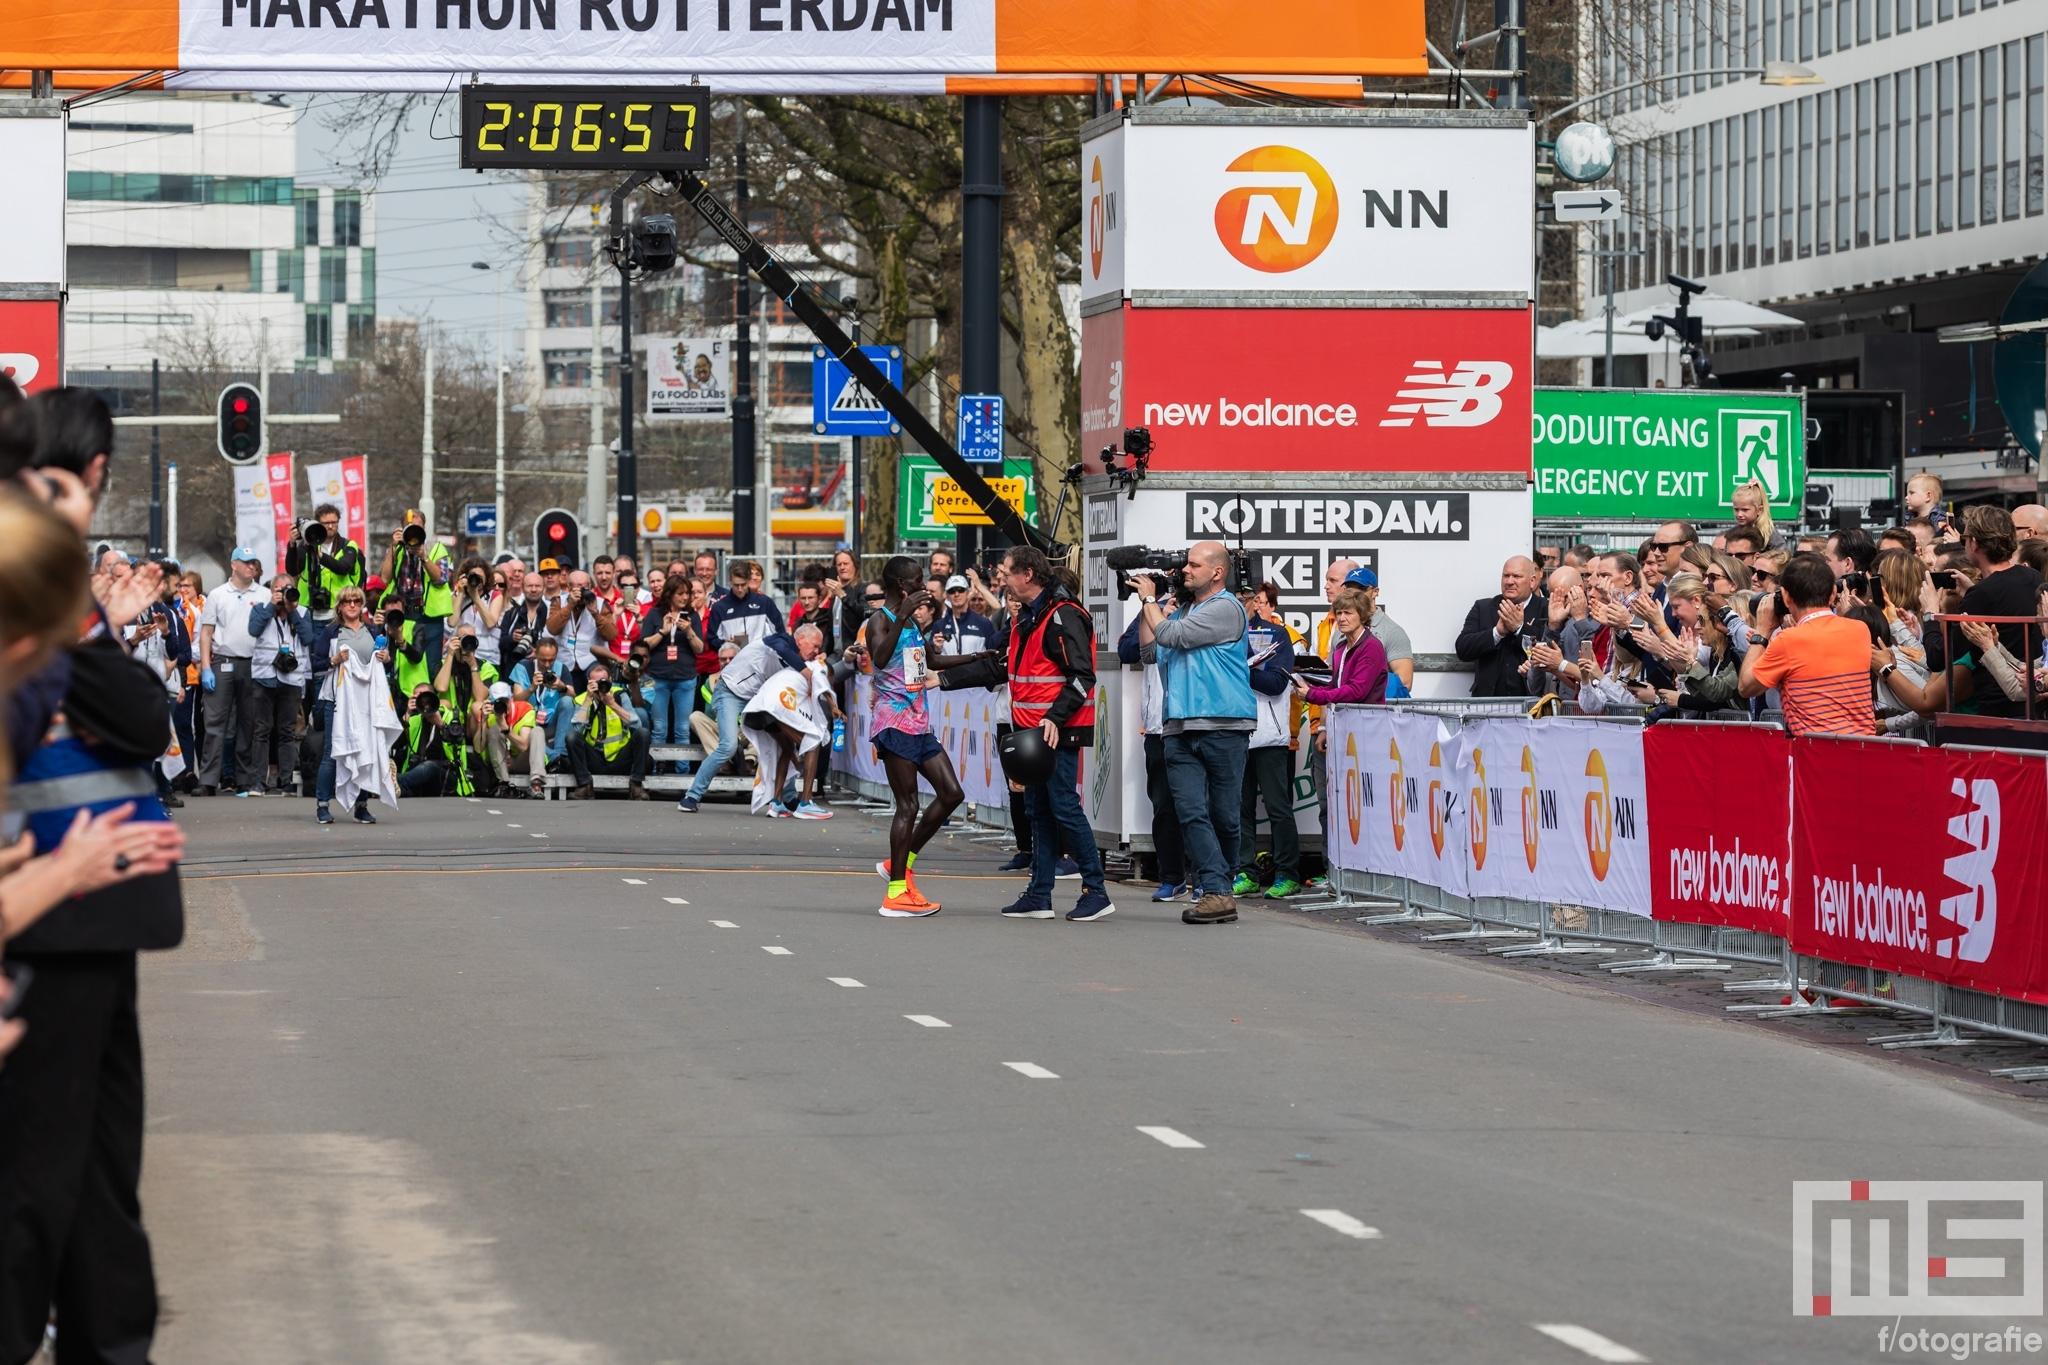 Marathon Mevrouw Foto's Nn Rotterdam De 2018 5qXI7SPww